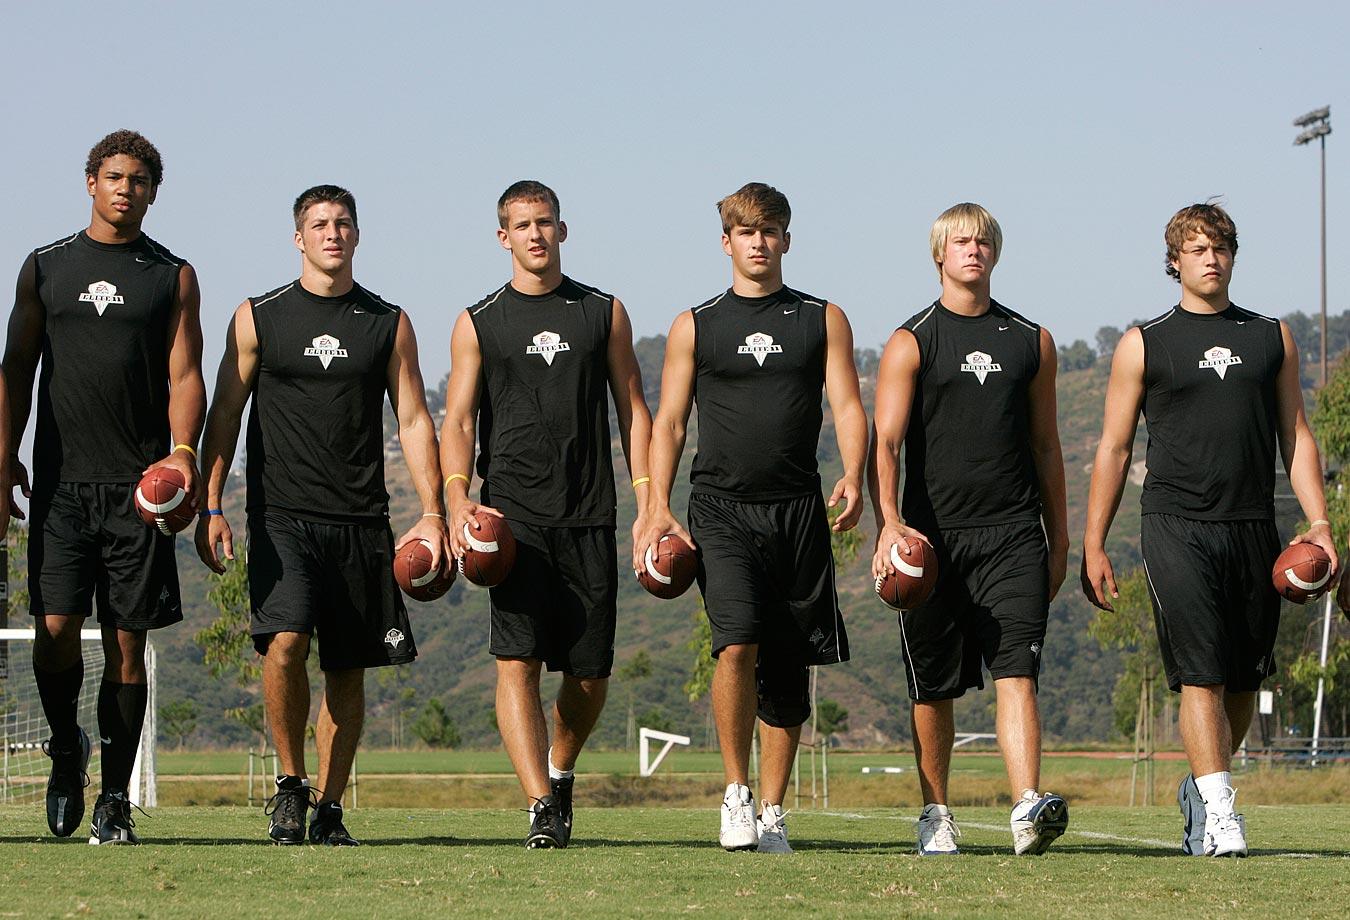 Tim Tebow walks with Josh Freeman, Pat Devlin, Neil Caudle, Jevan Snead and Matthew Stafford during quarterback camp.